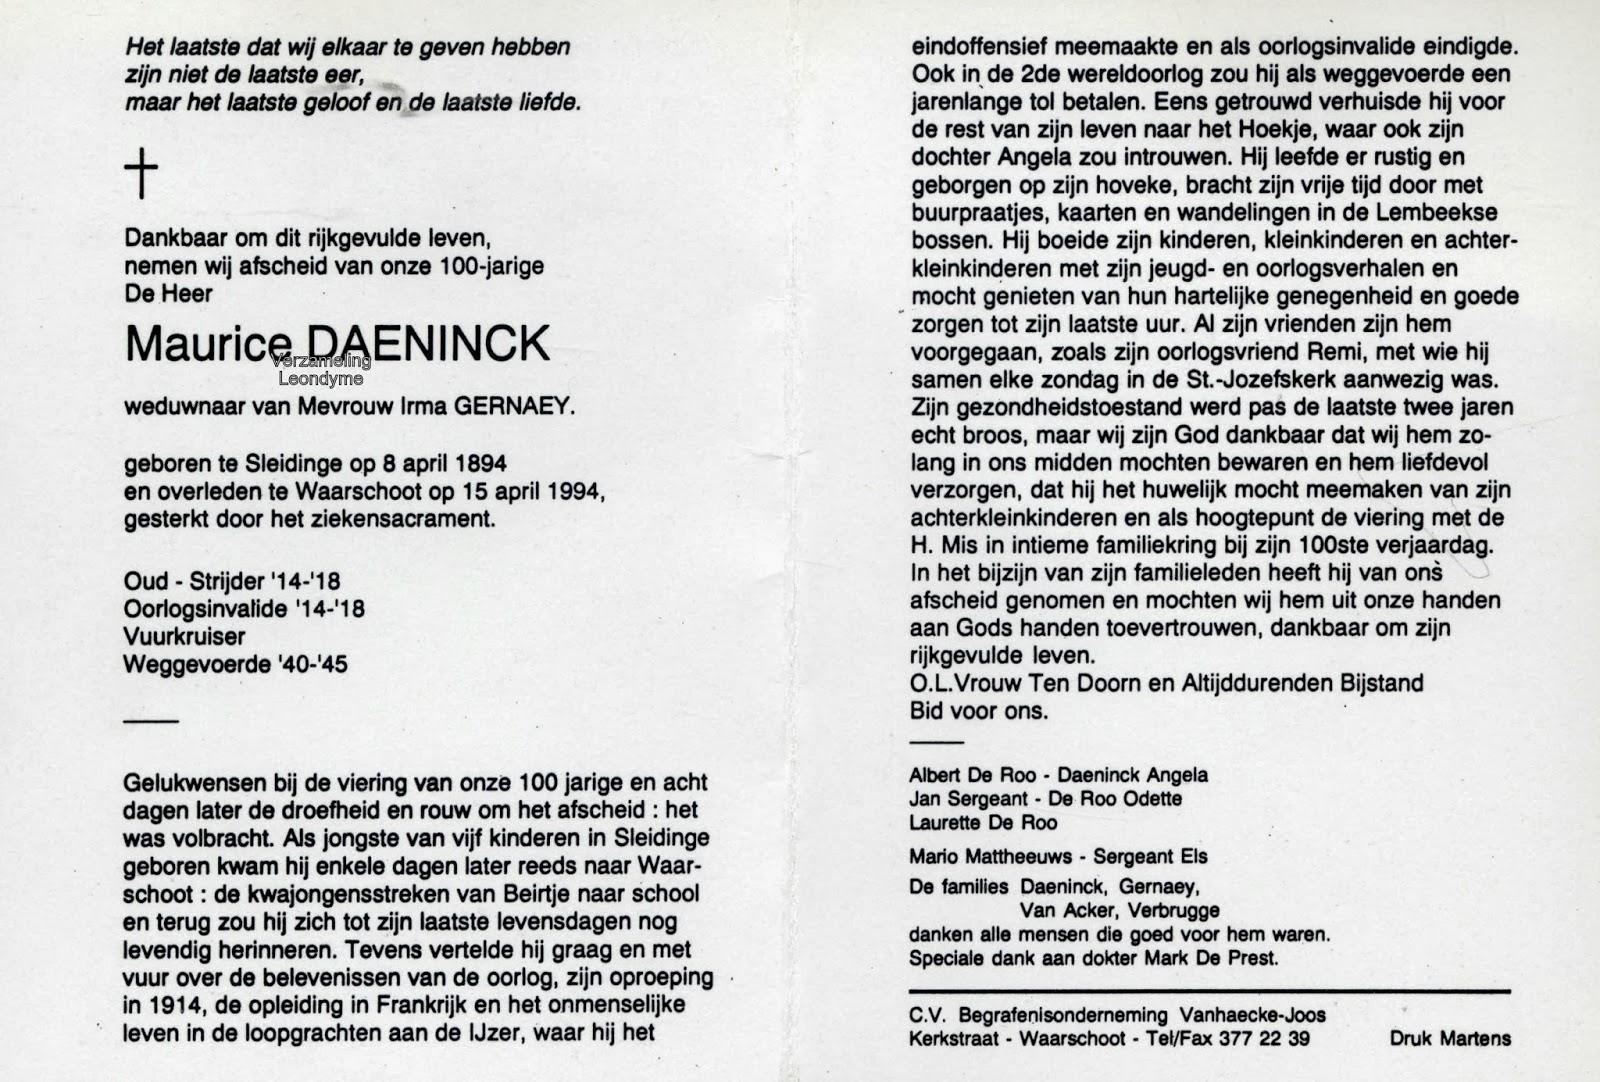 Bidprentje Maurice Daeninck. Verzameling Leondyme.